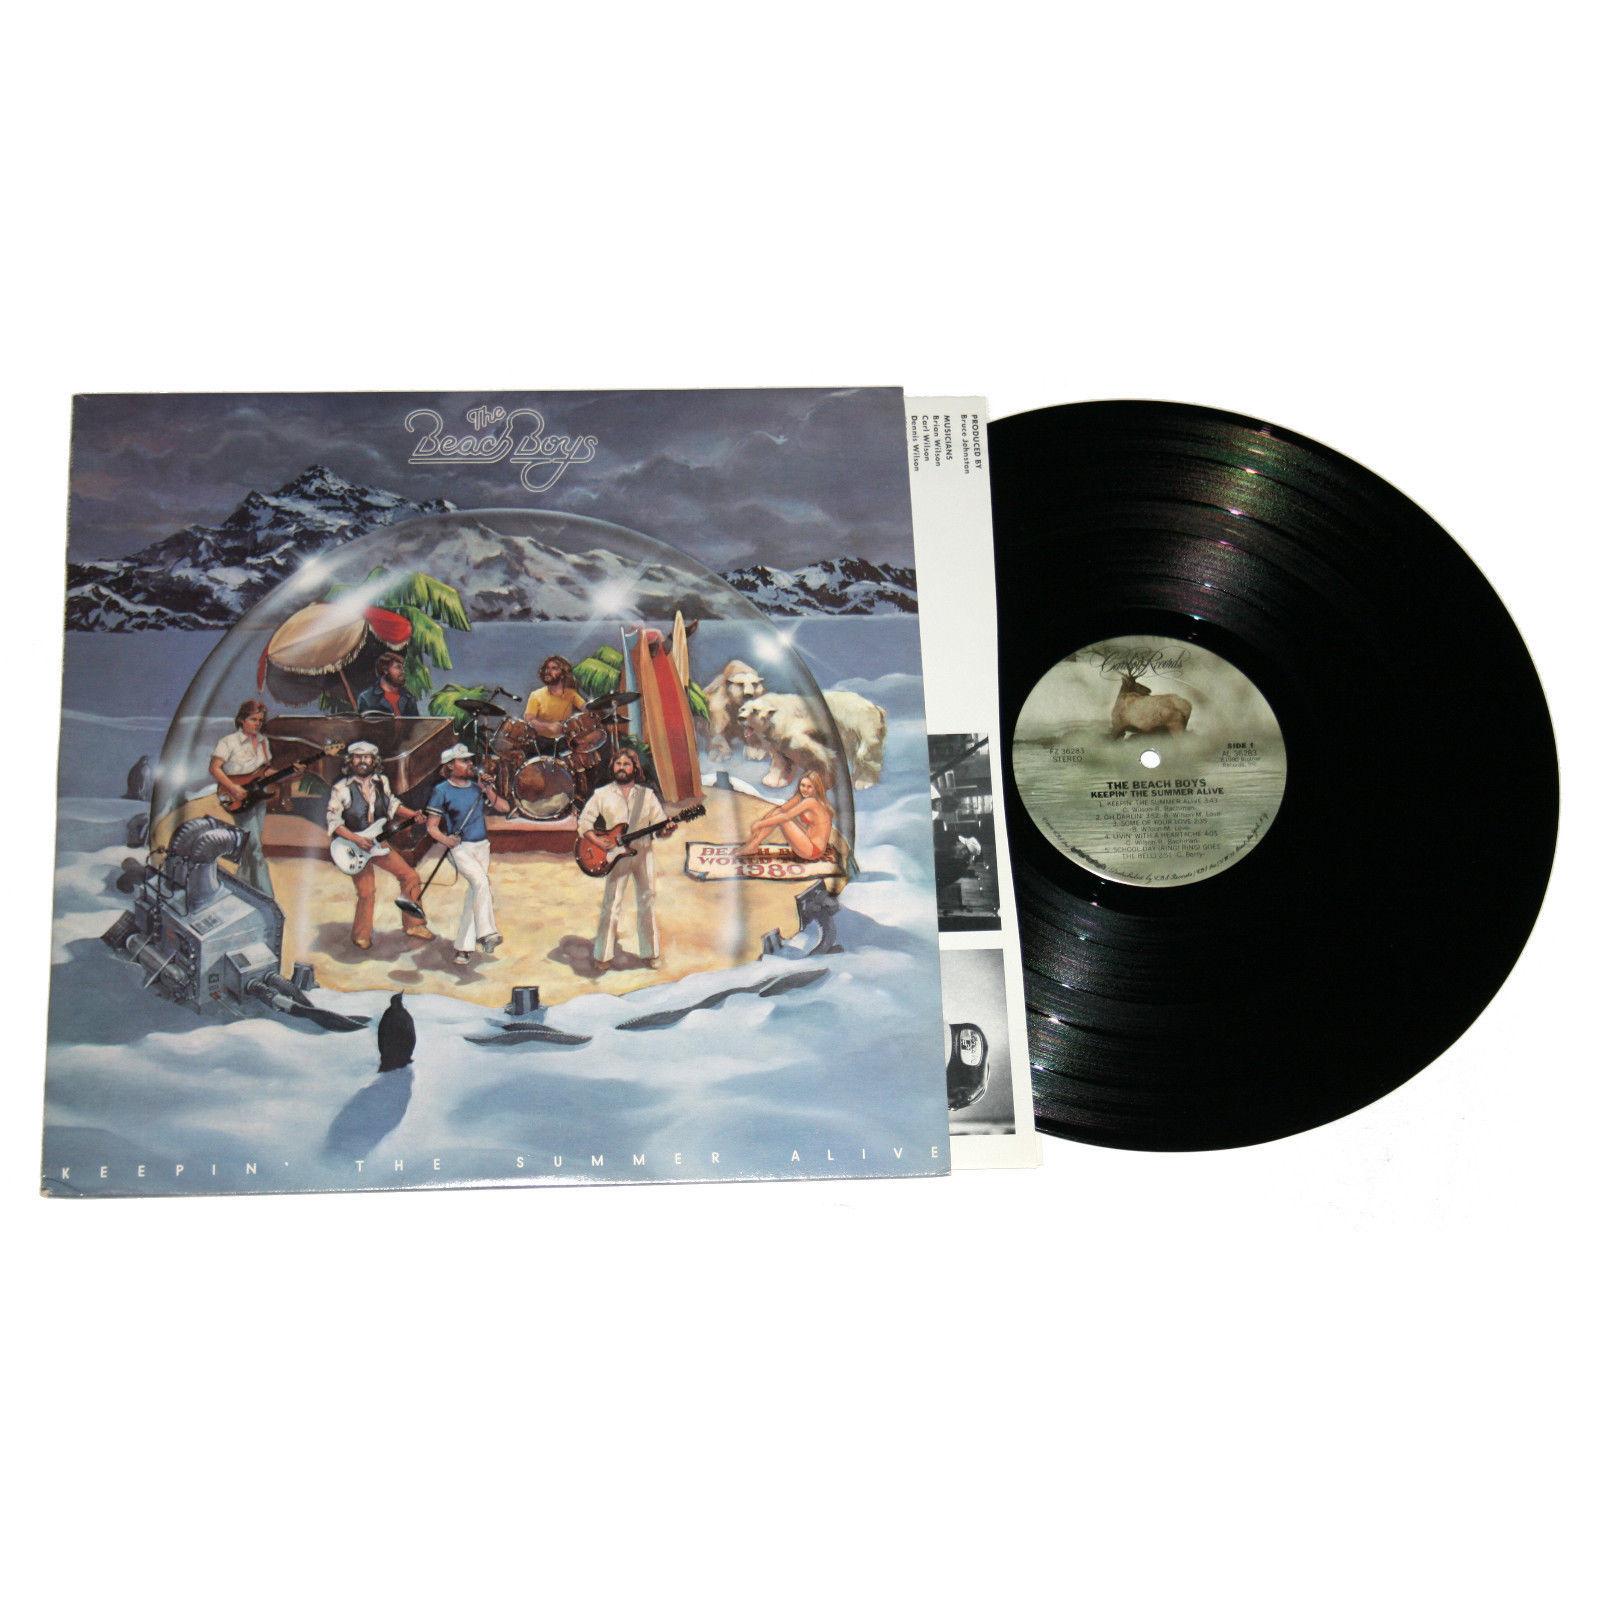 The Beach Boys - Keepin' The Summer Alive Album